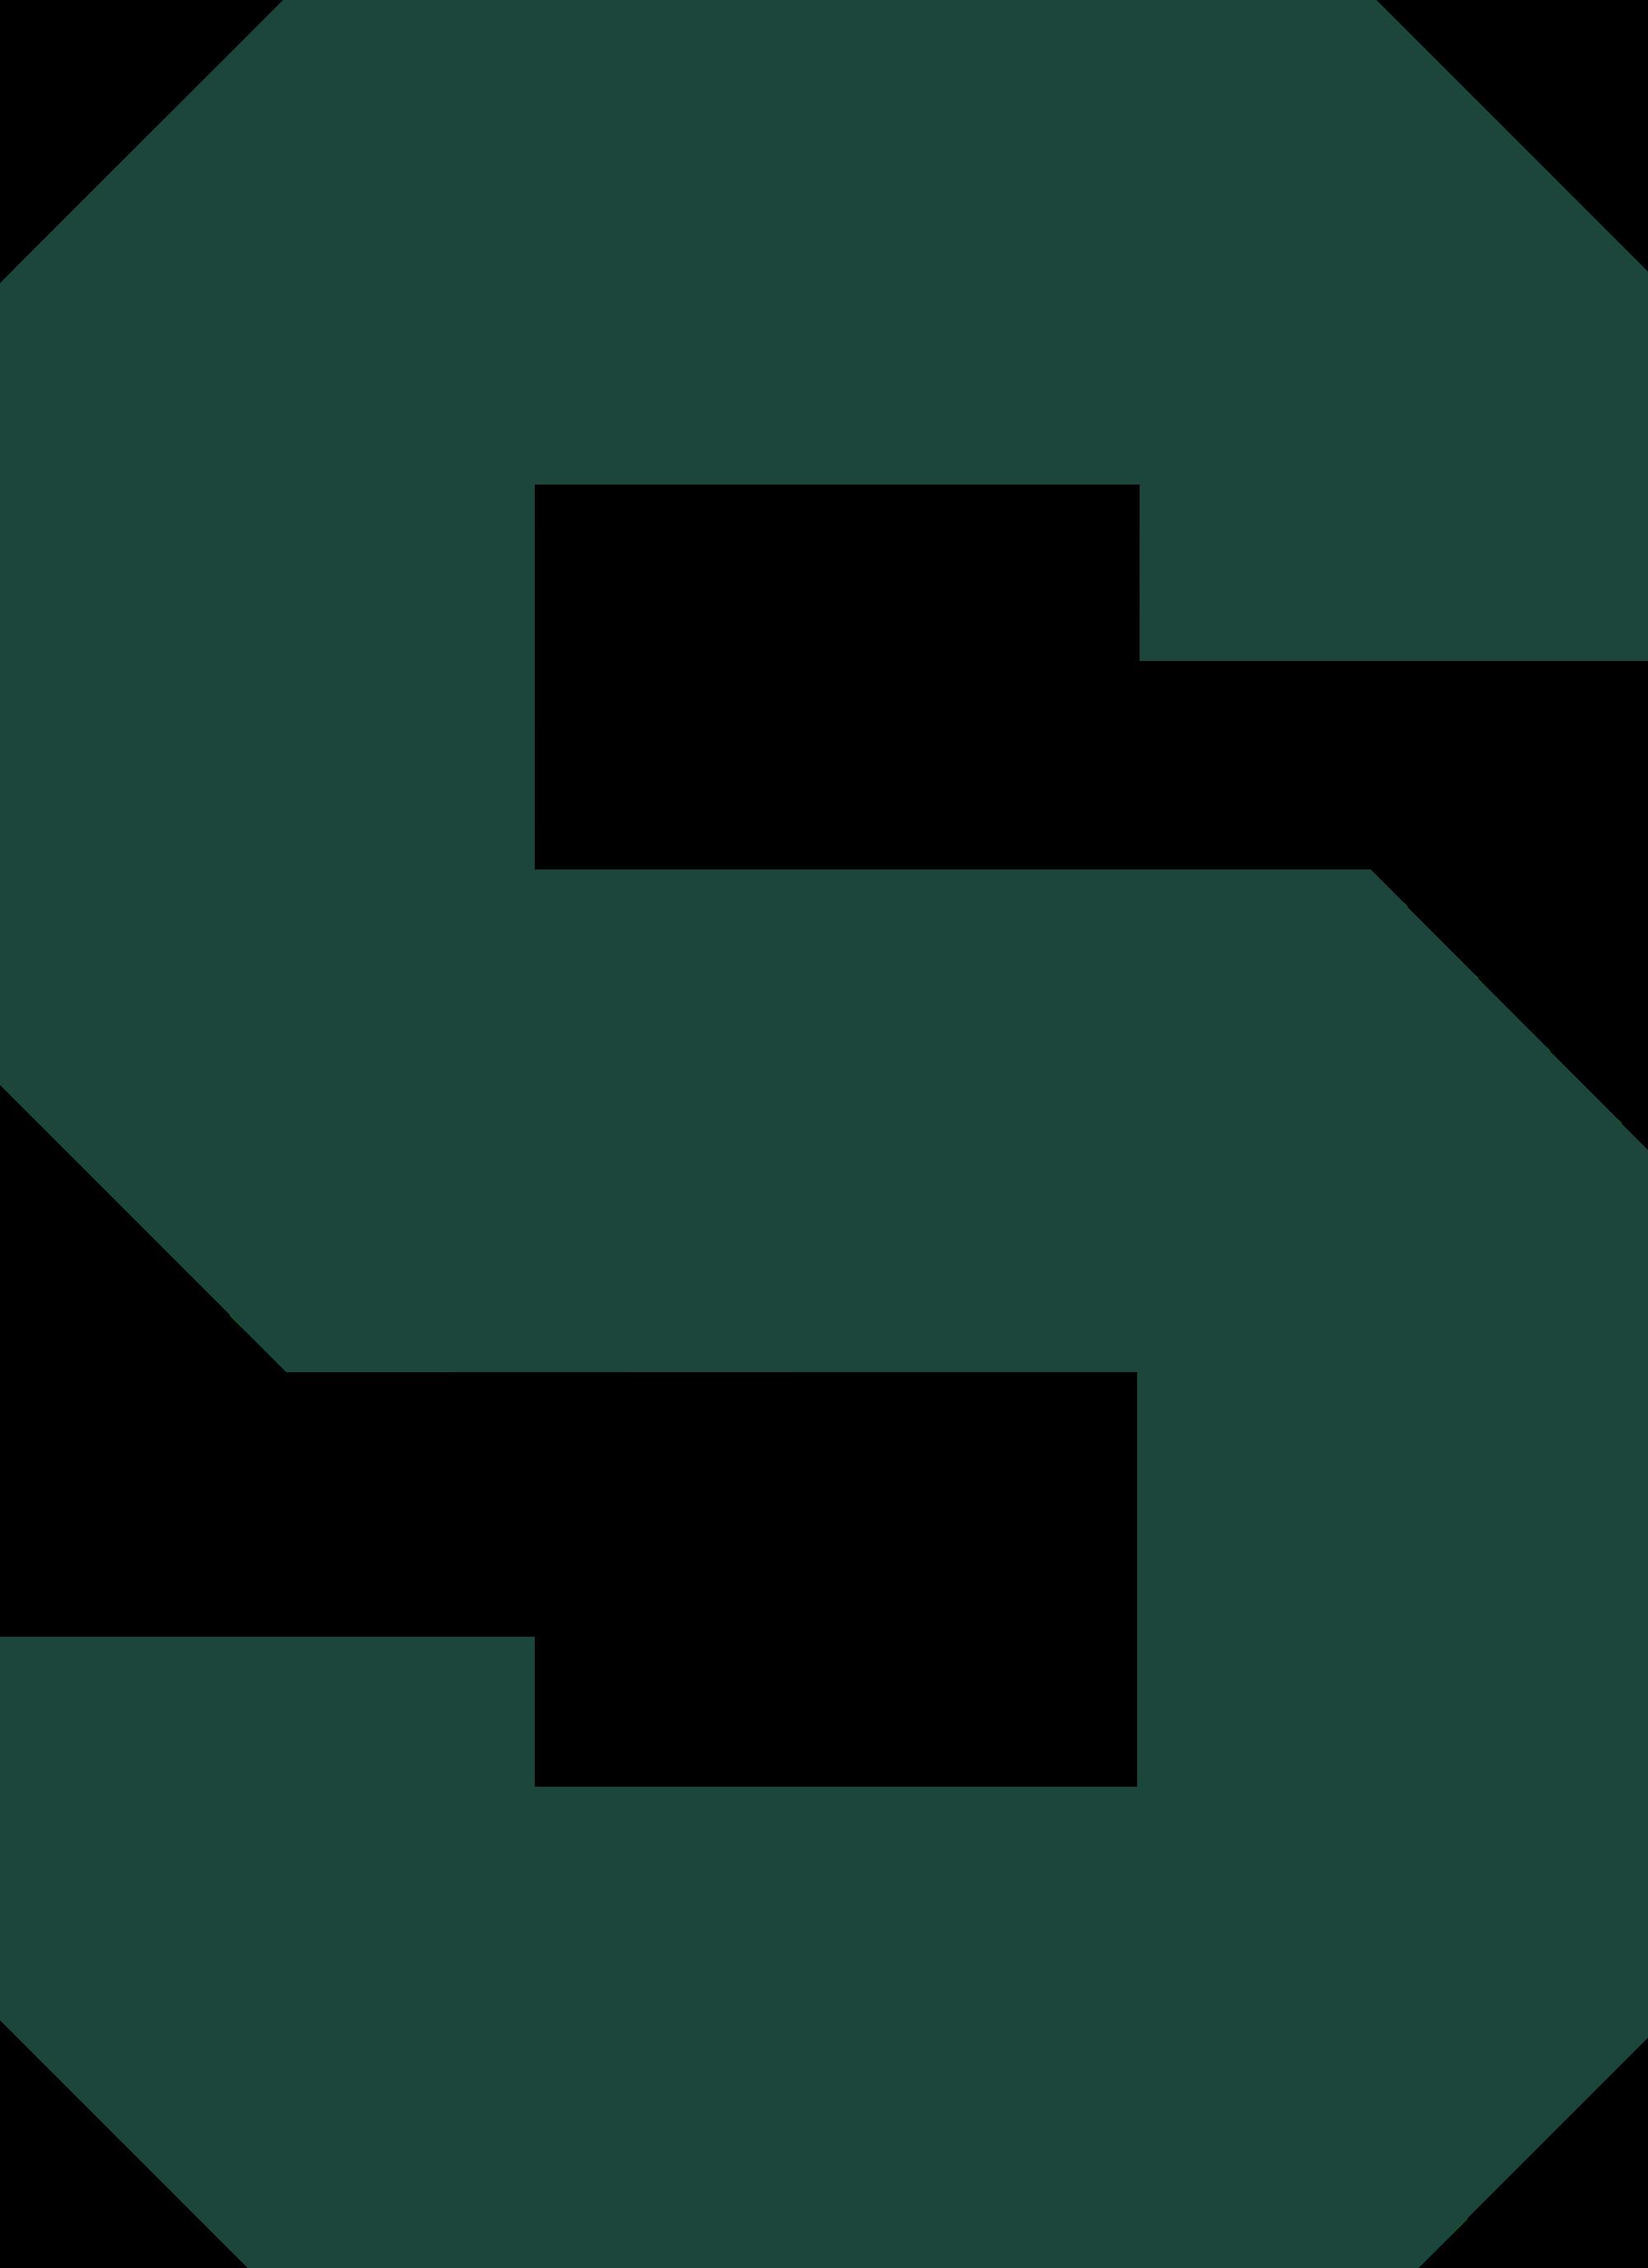 Michigan state logo clip art vector black and white stock Michigan State Spartan Logo Clip Art - ClipArt Best vector black and white stock